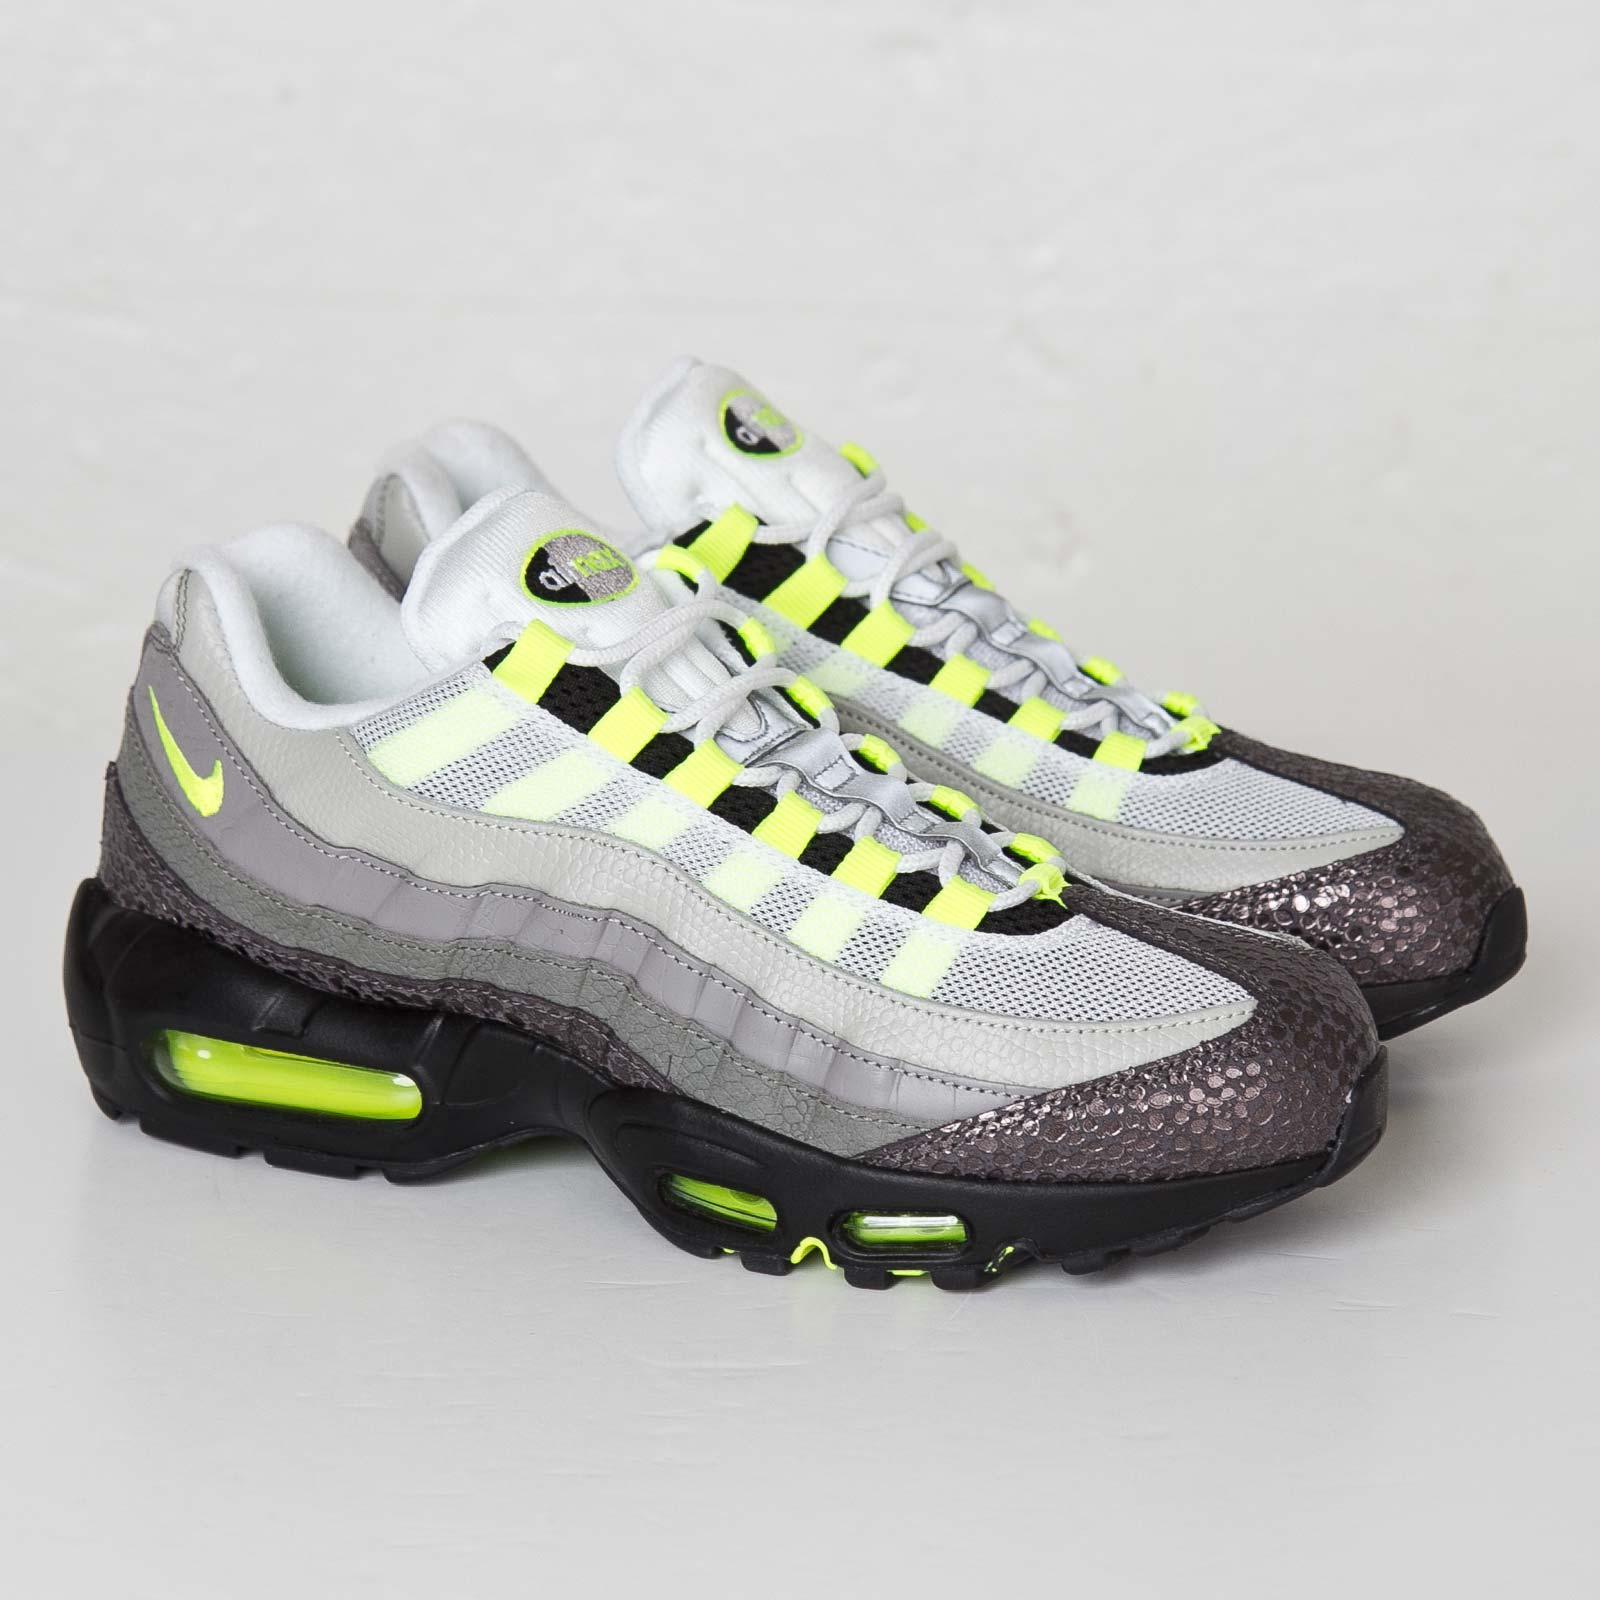 quality design d48f5 4106d Nike Air Max 95 OG Premium